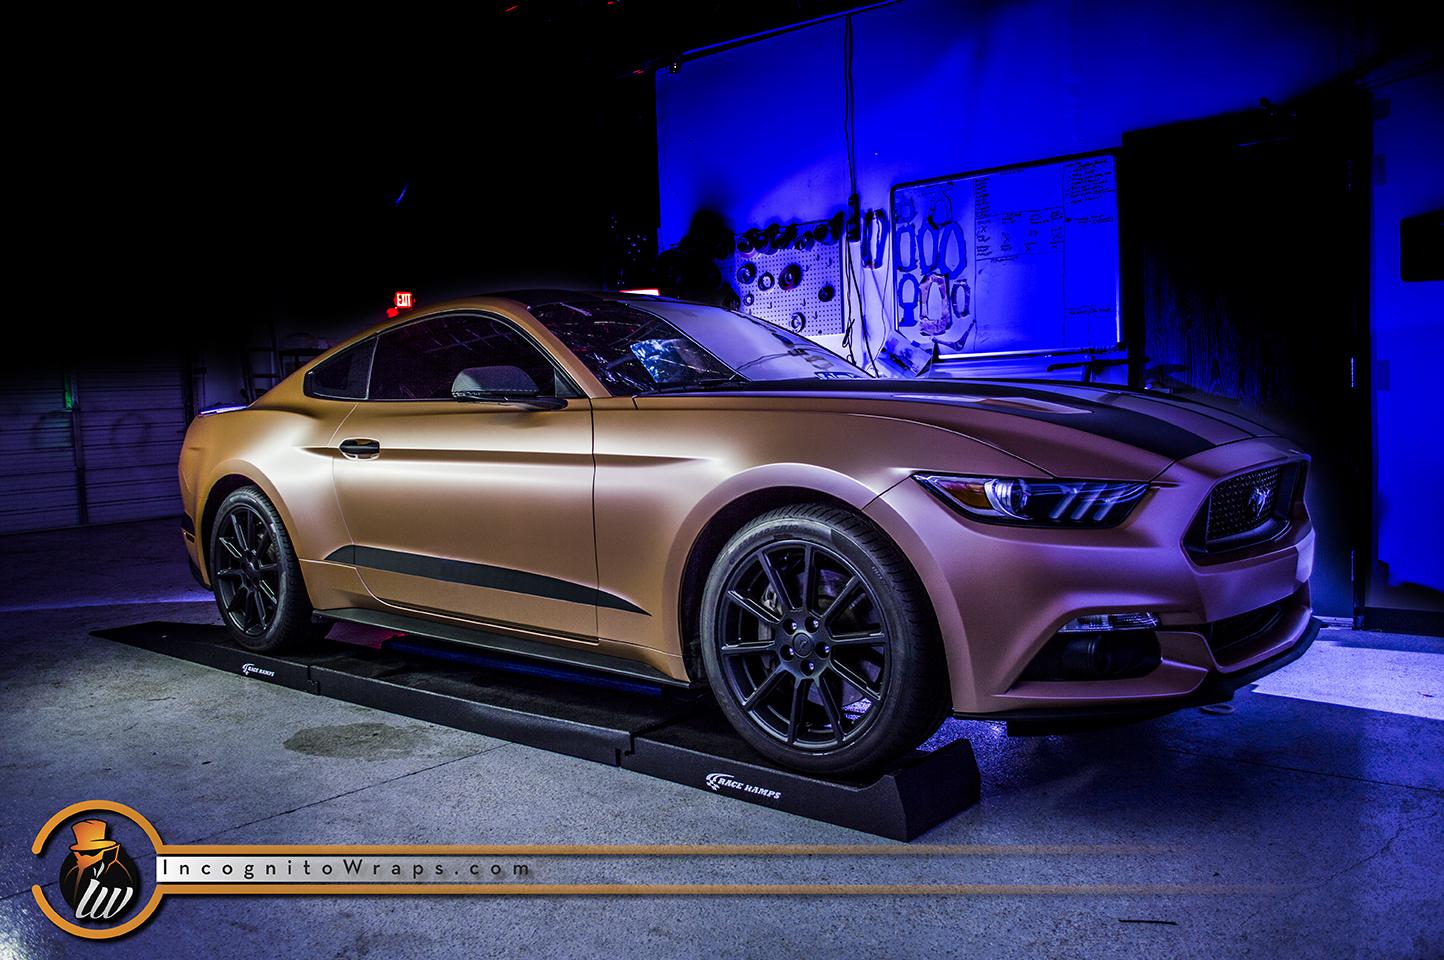 Ford Mustang GT Satin Caramel Luster